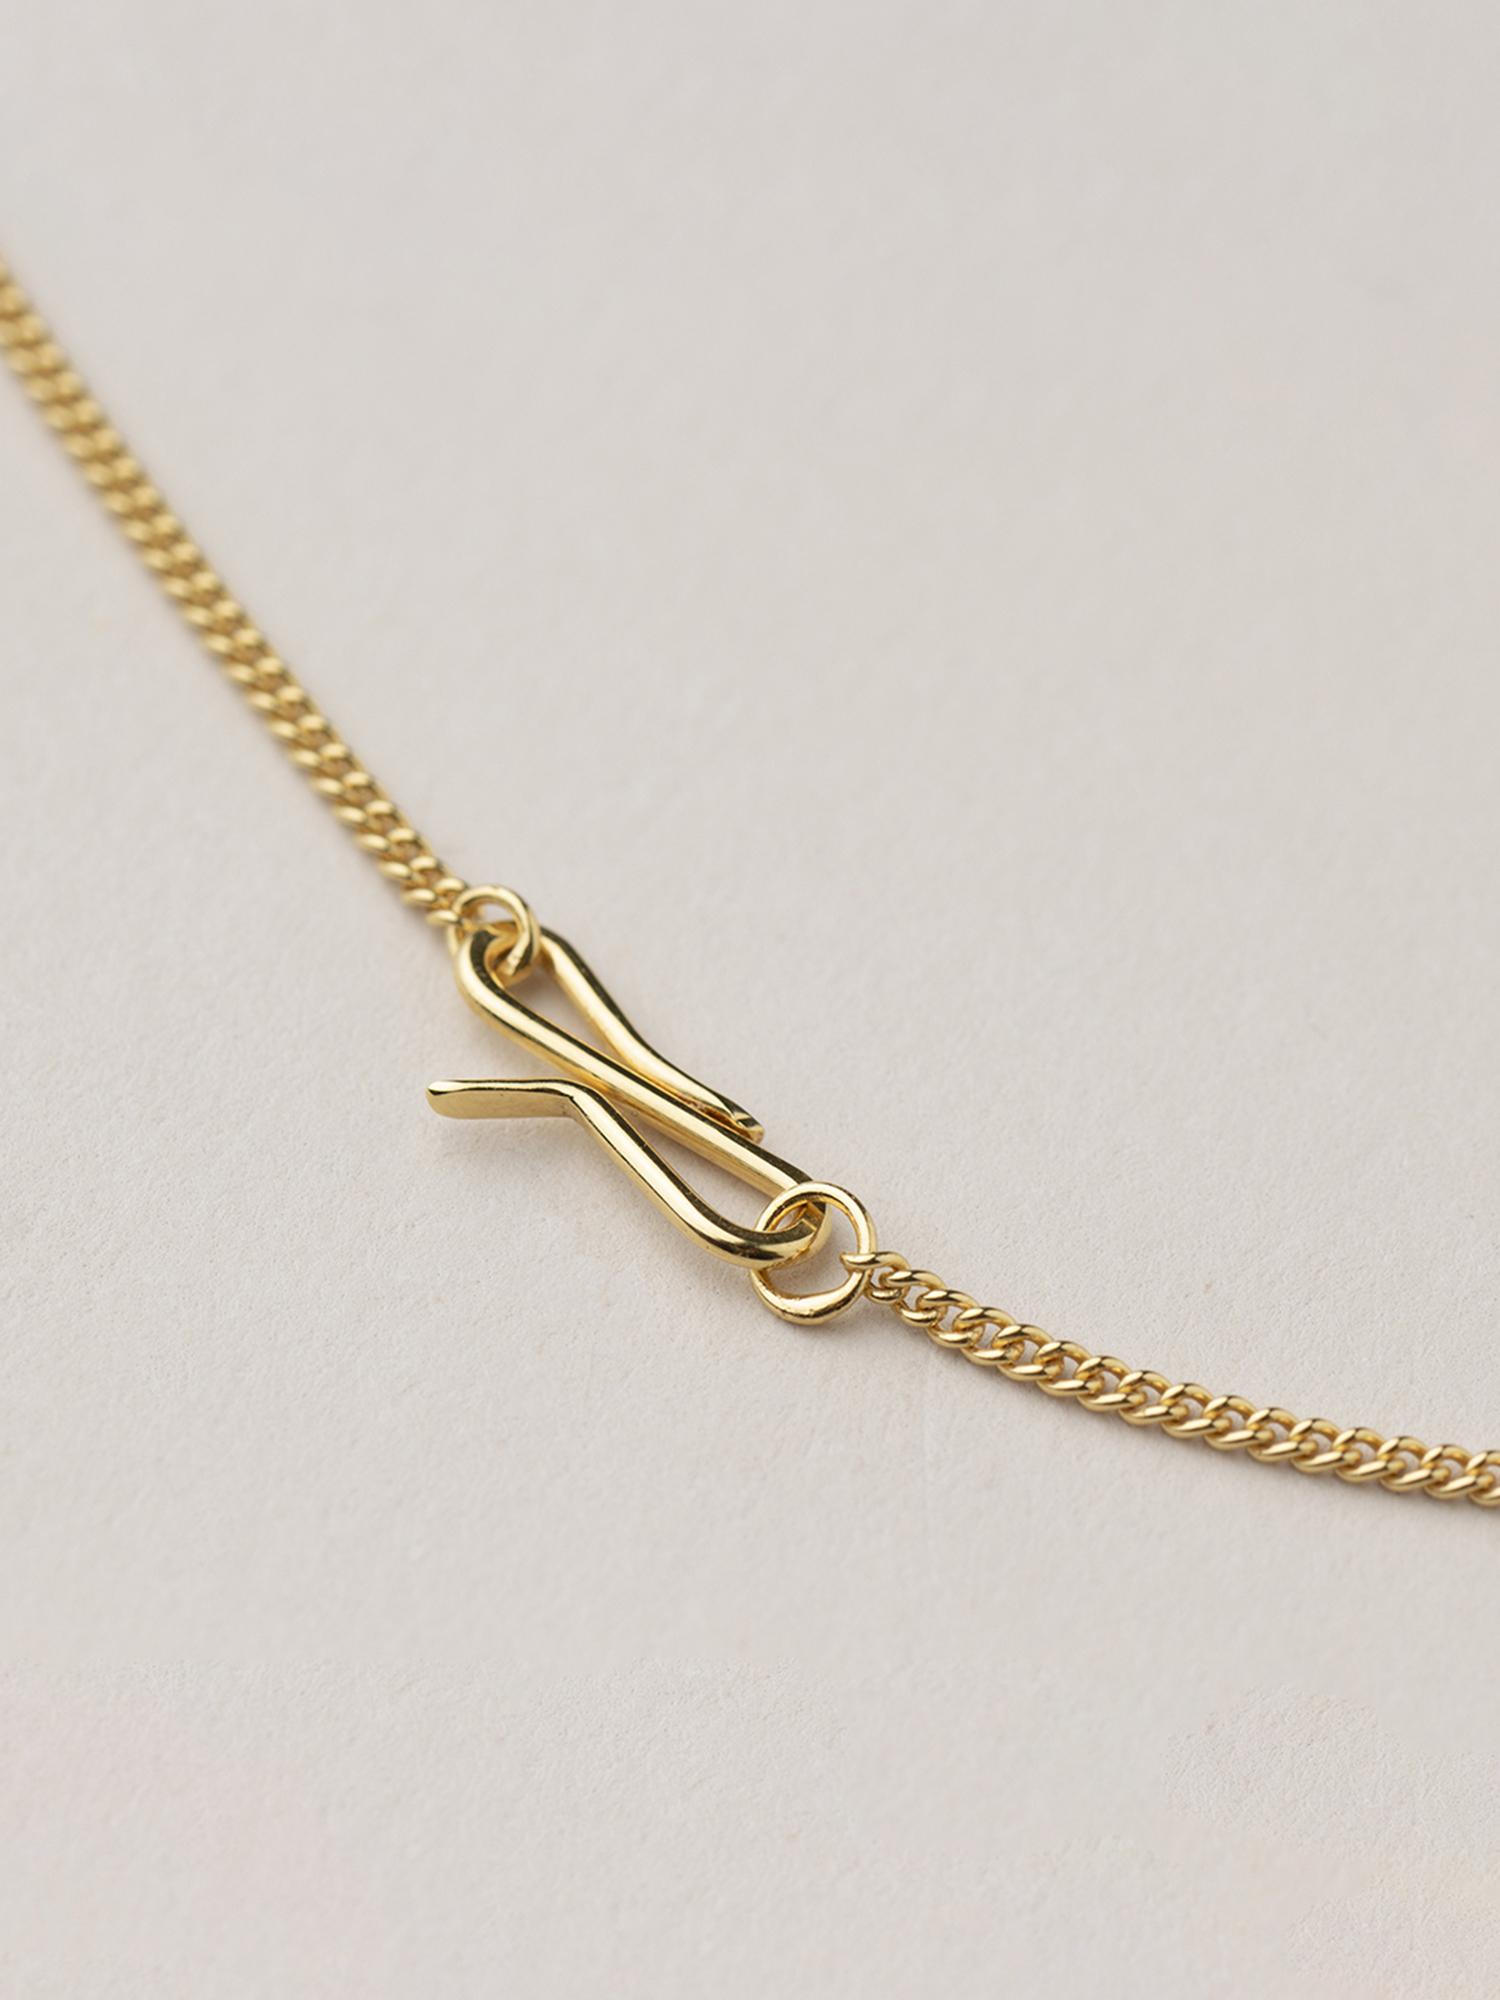 Detail Amia Ketten, der S-Haken Verschluss  Detail Amia necklaces, the S-hook clasp